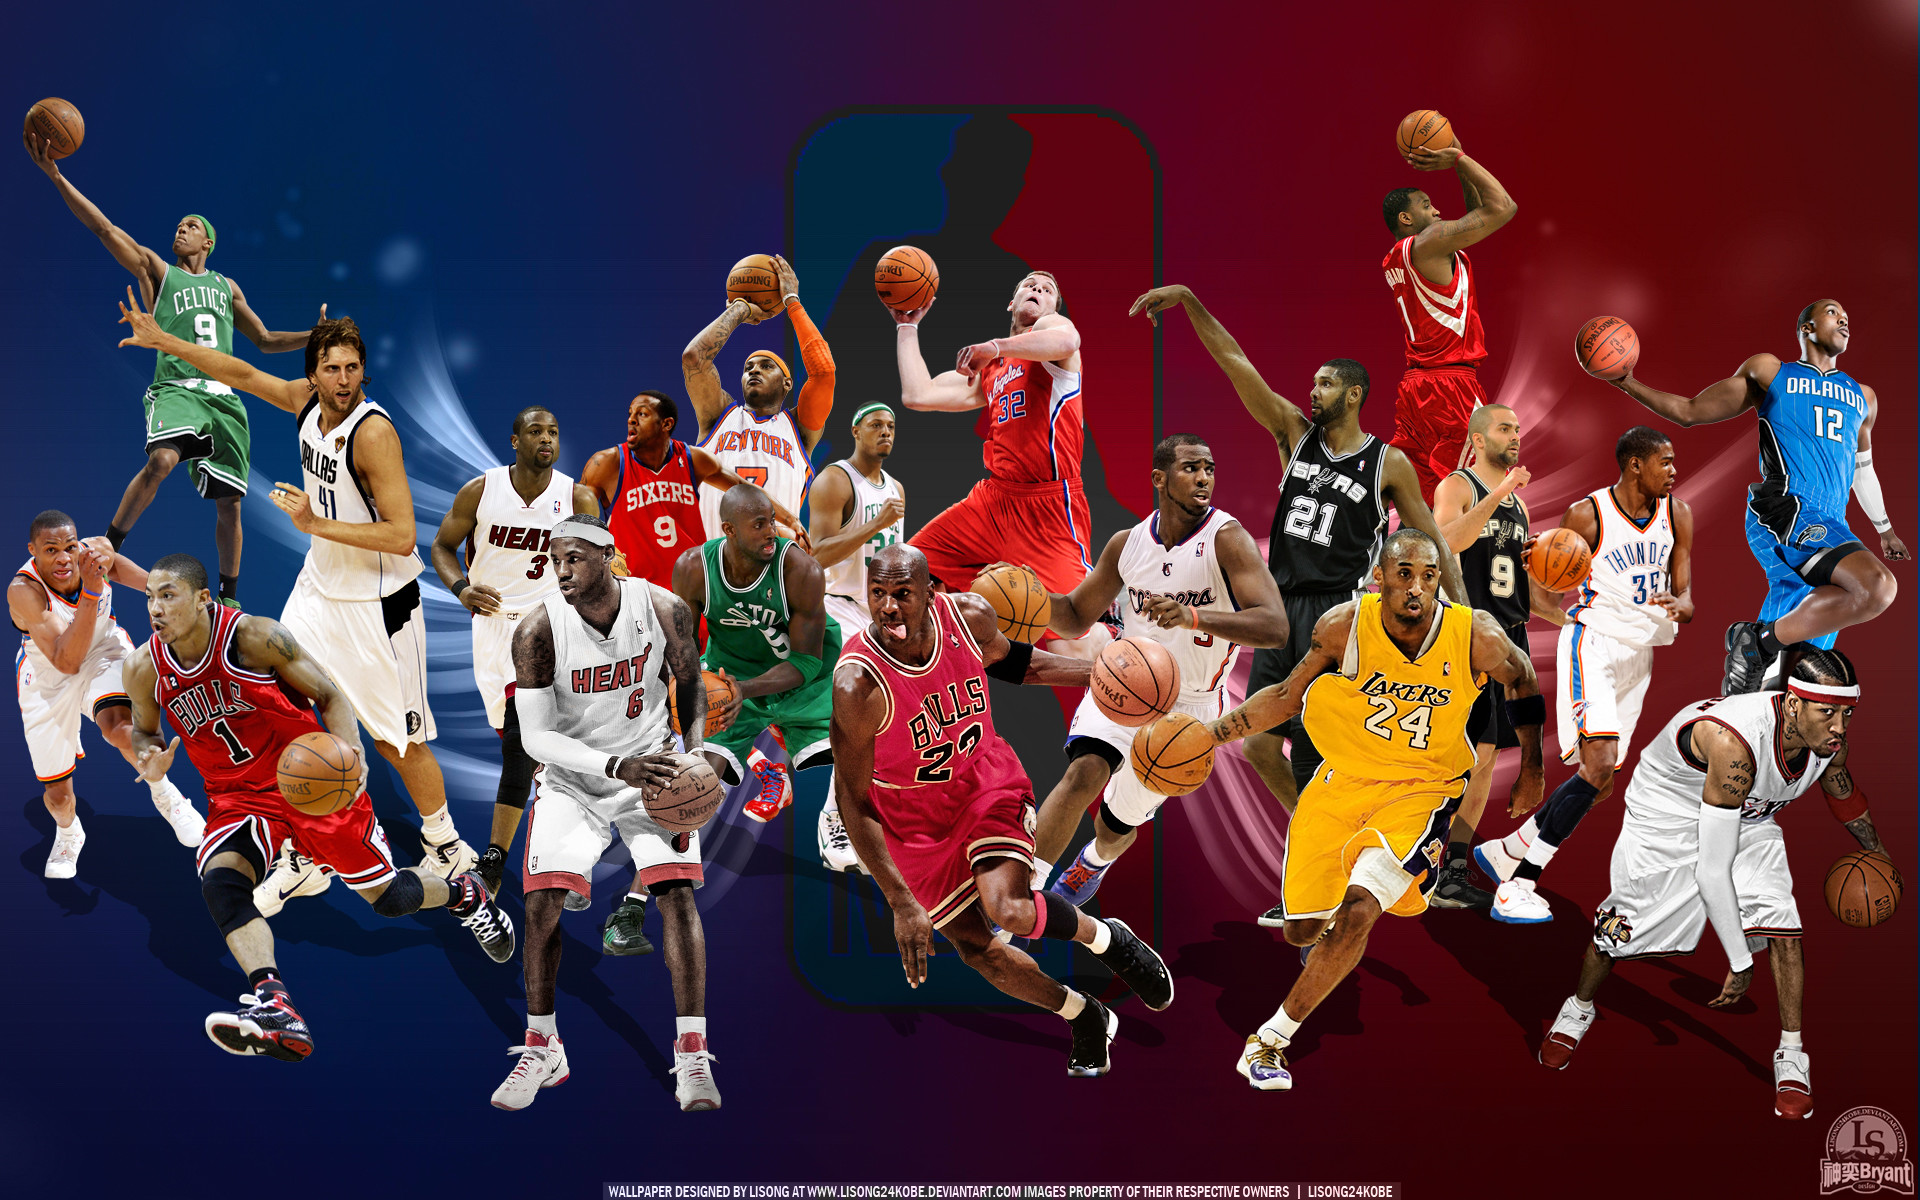 basketball wallpaper 2018 (59+ images)